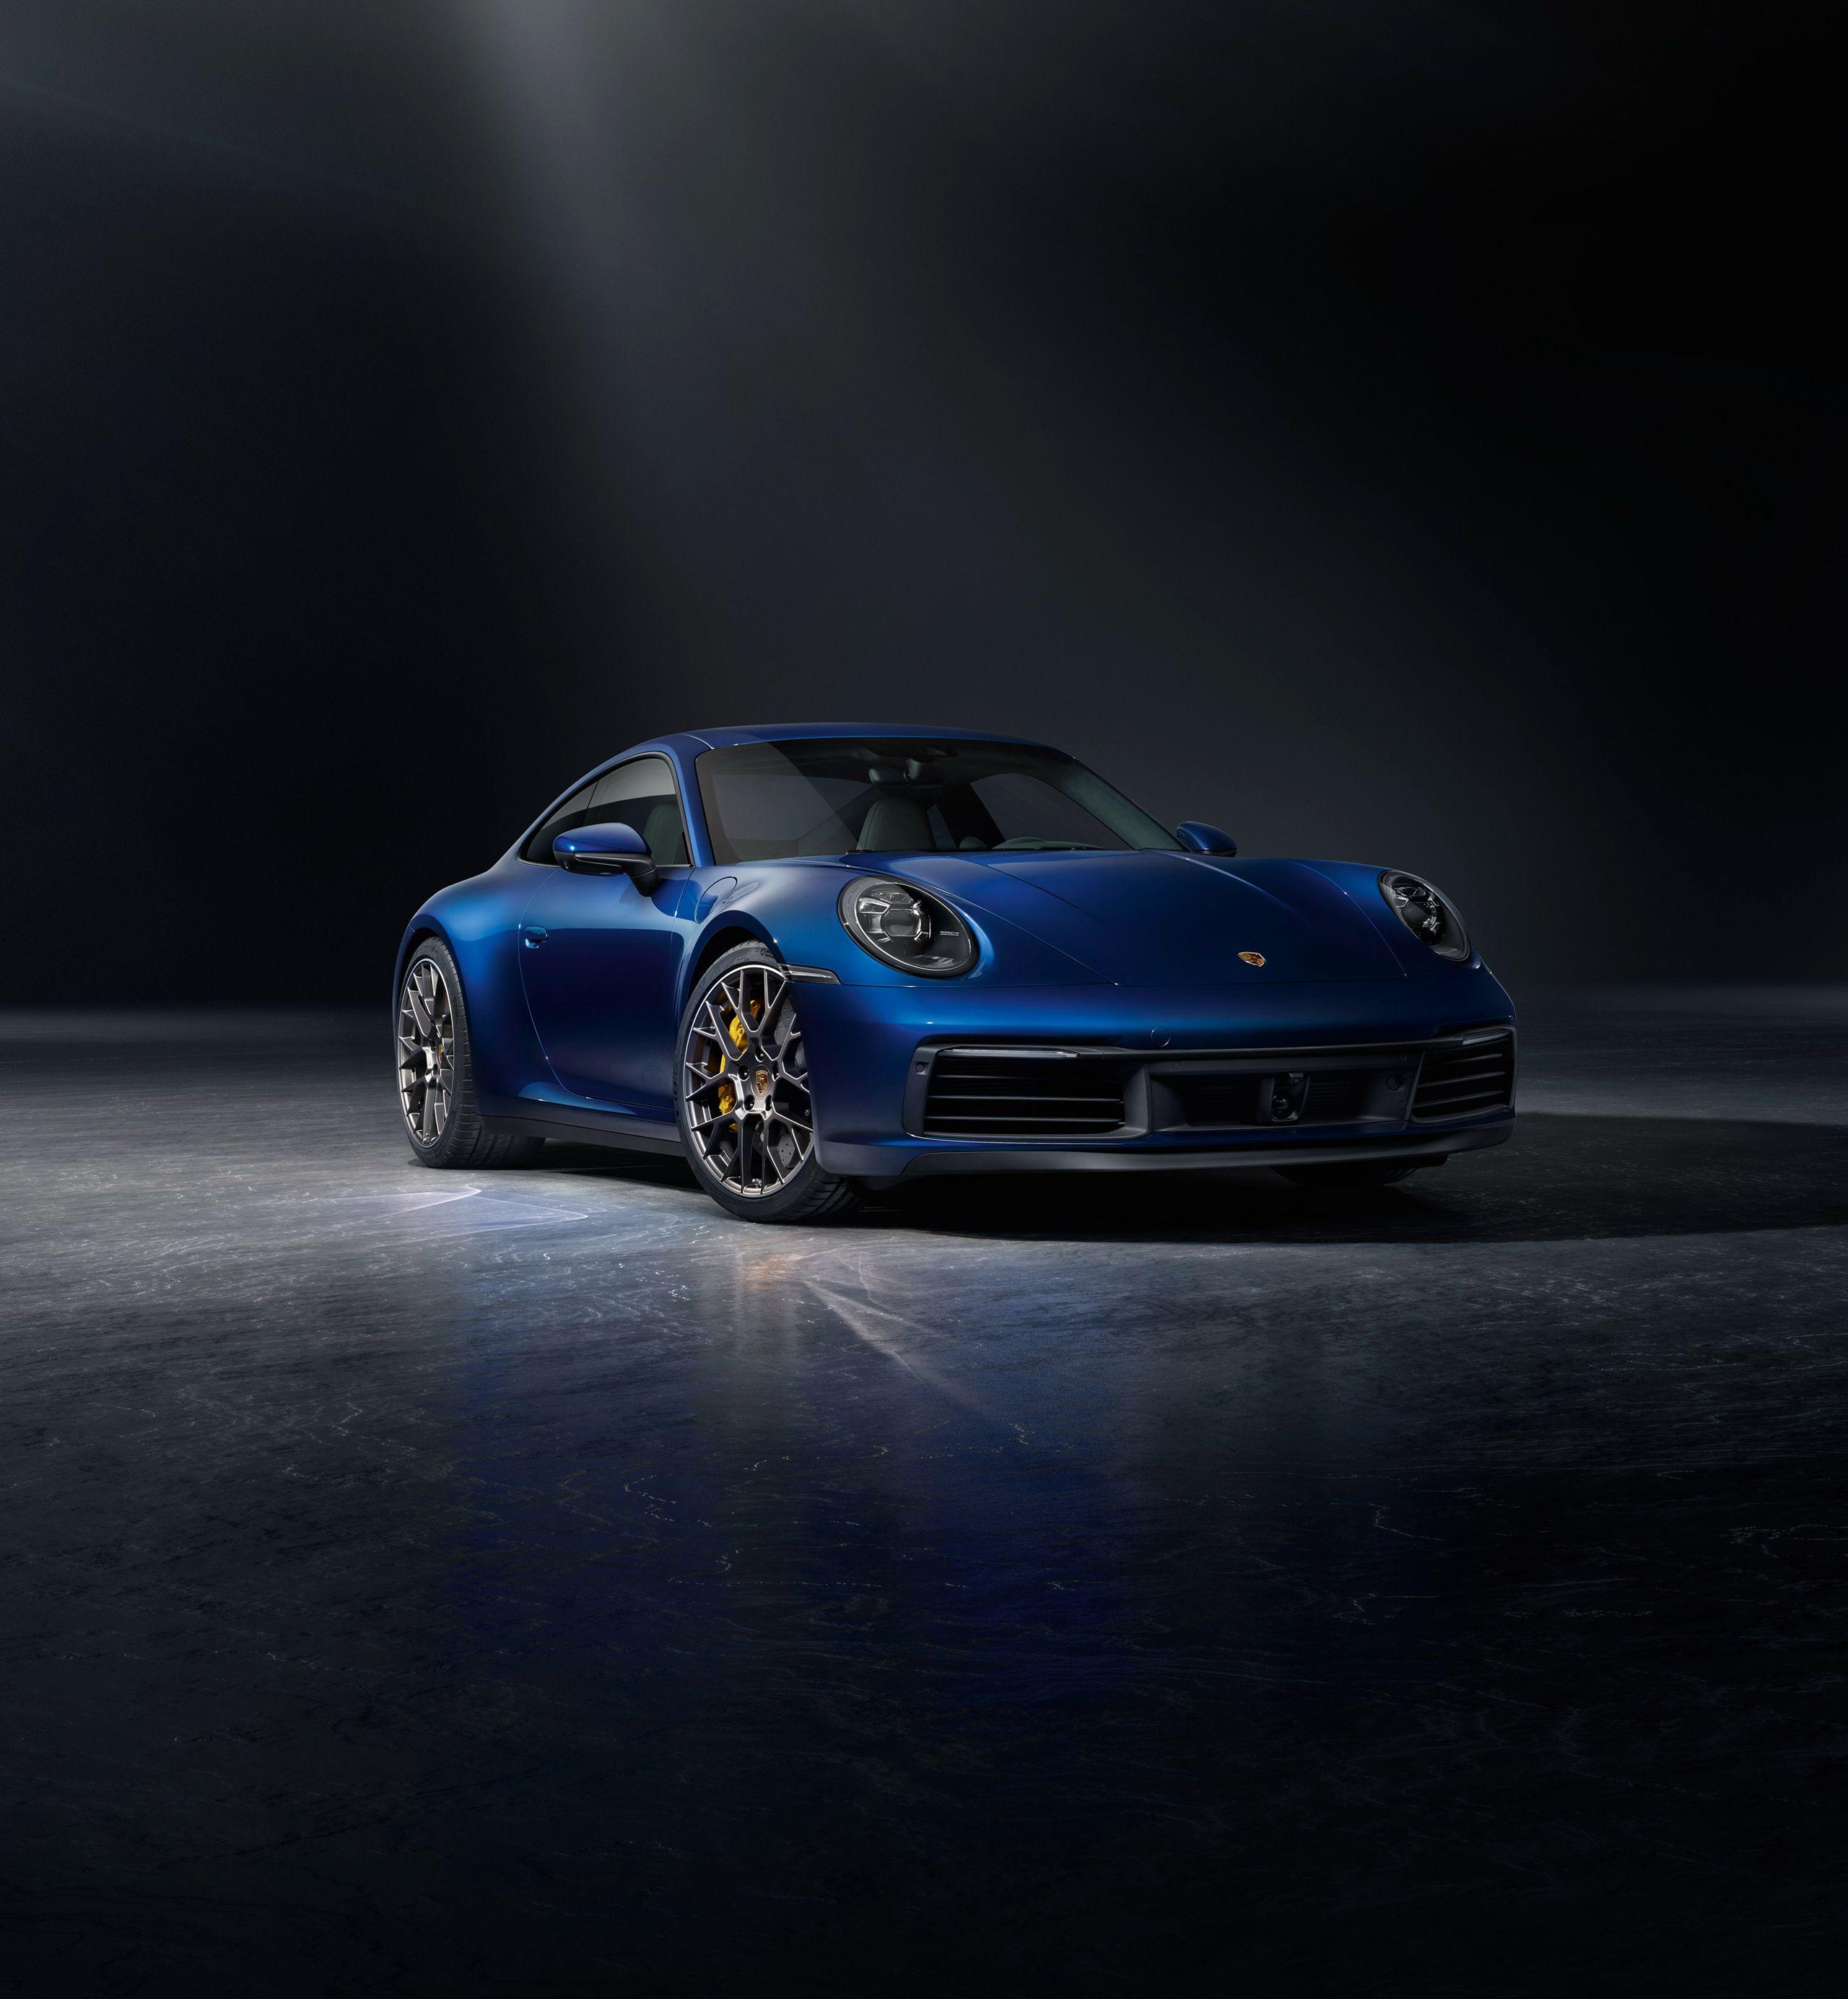 Porsche 911 Classic: Blue Porsche 911 Classic IPhone Wallpapers